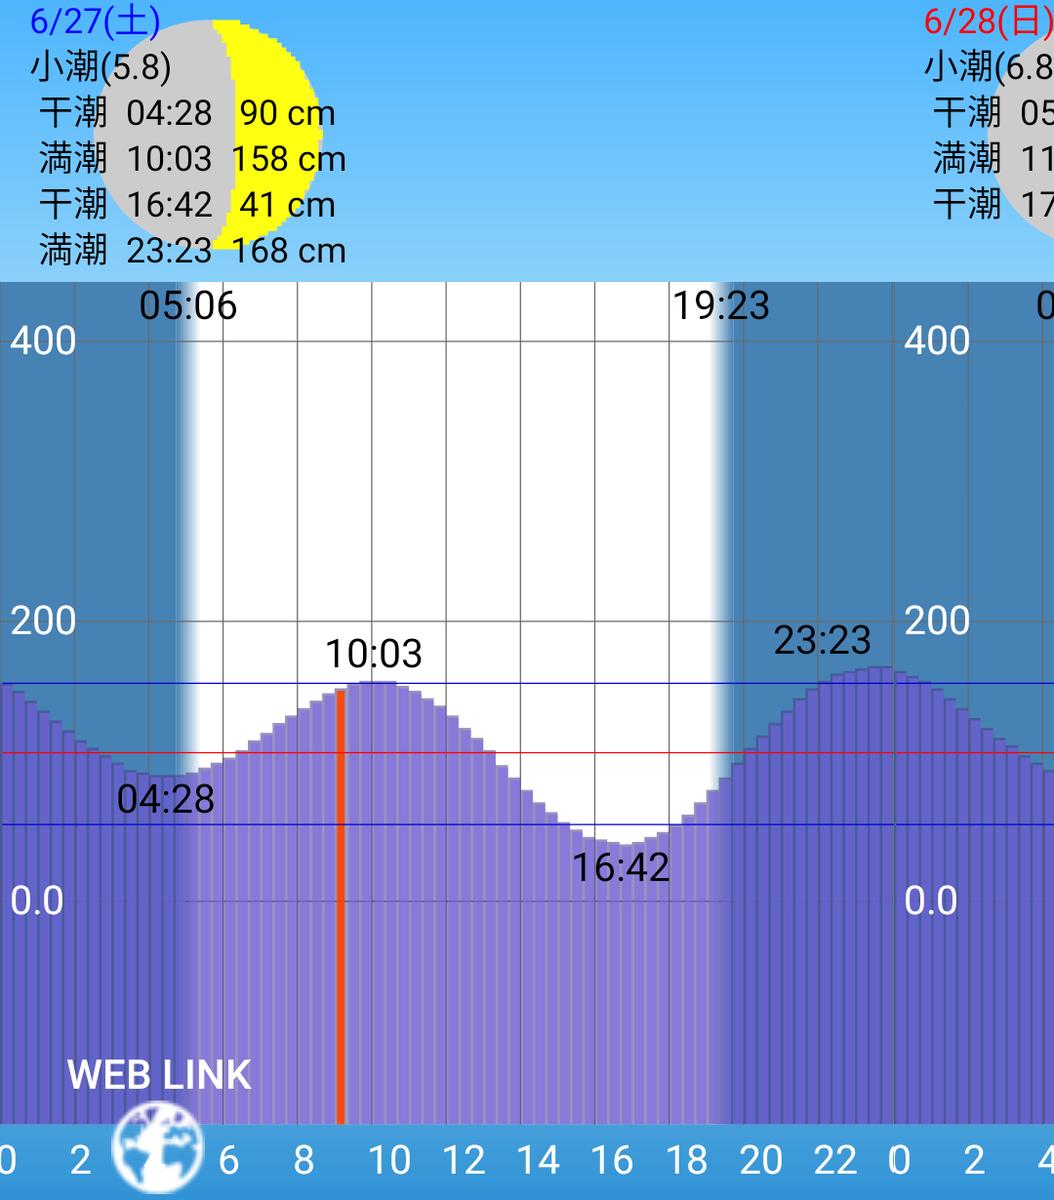 f:id:bokuwabokumasake:20200628063118p:plain